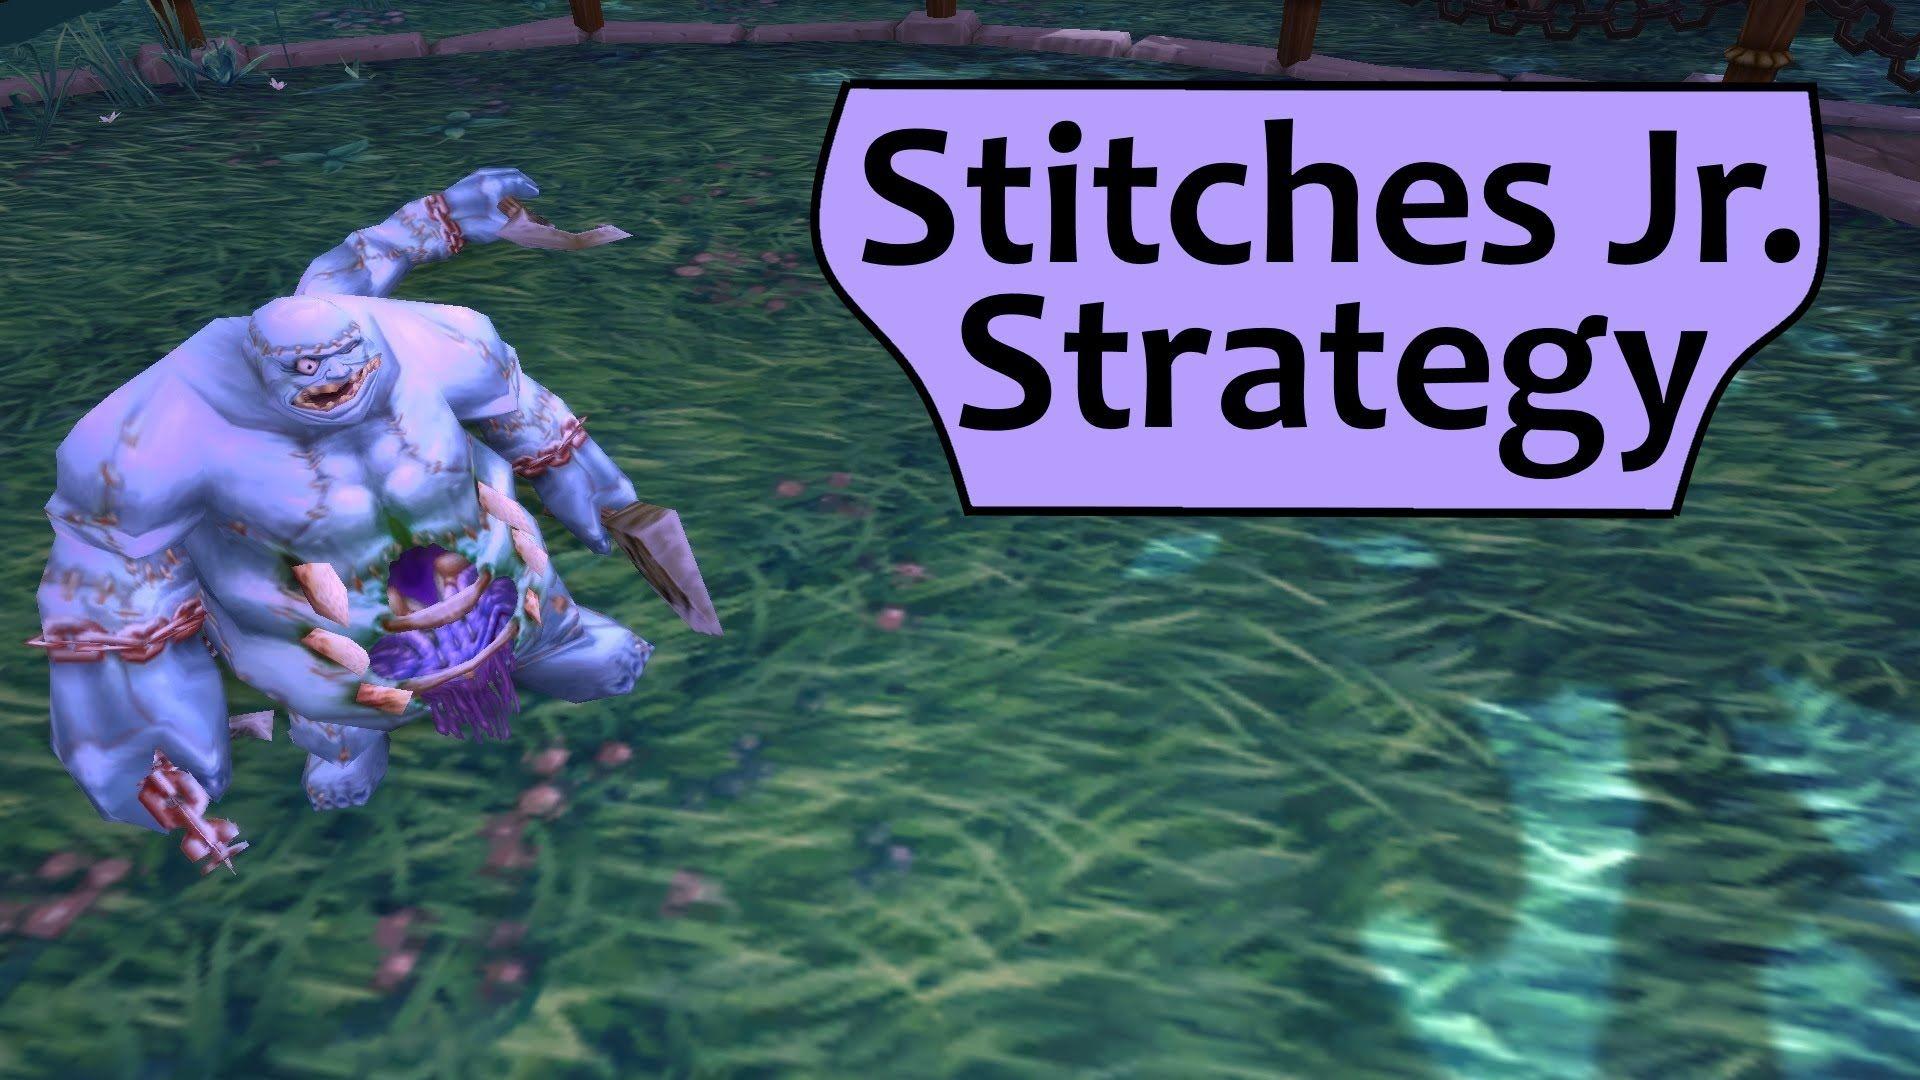 World Of Warcraft Wod Stitches Jr Garrison Menagerie Daily Pet